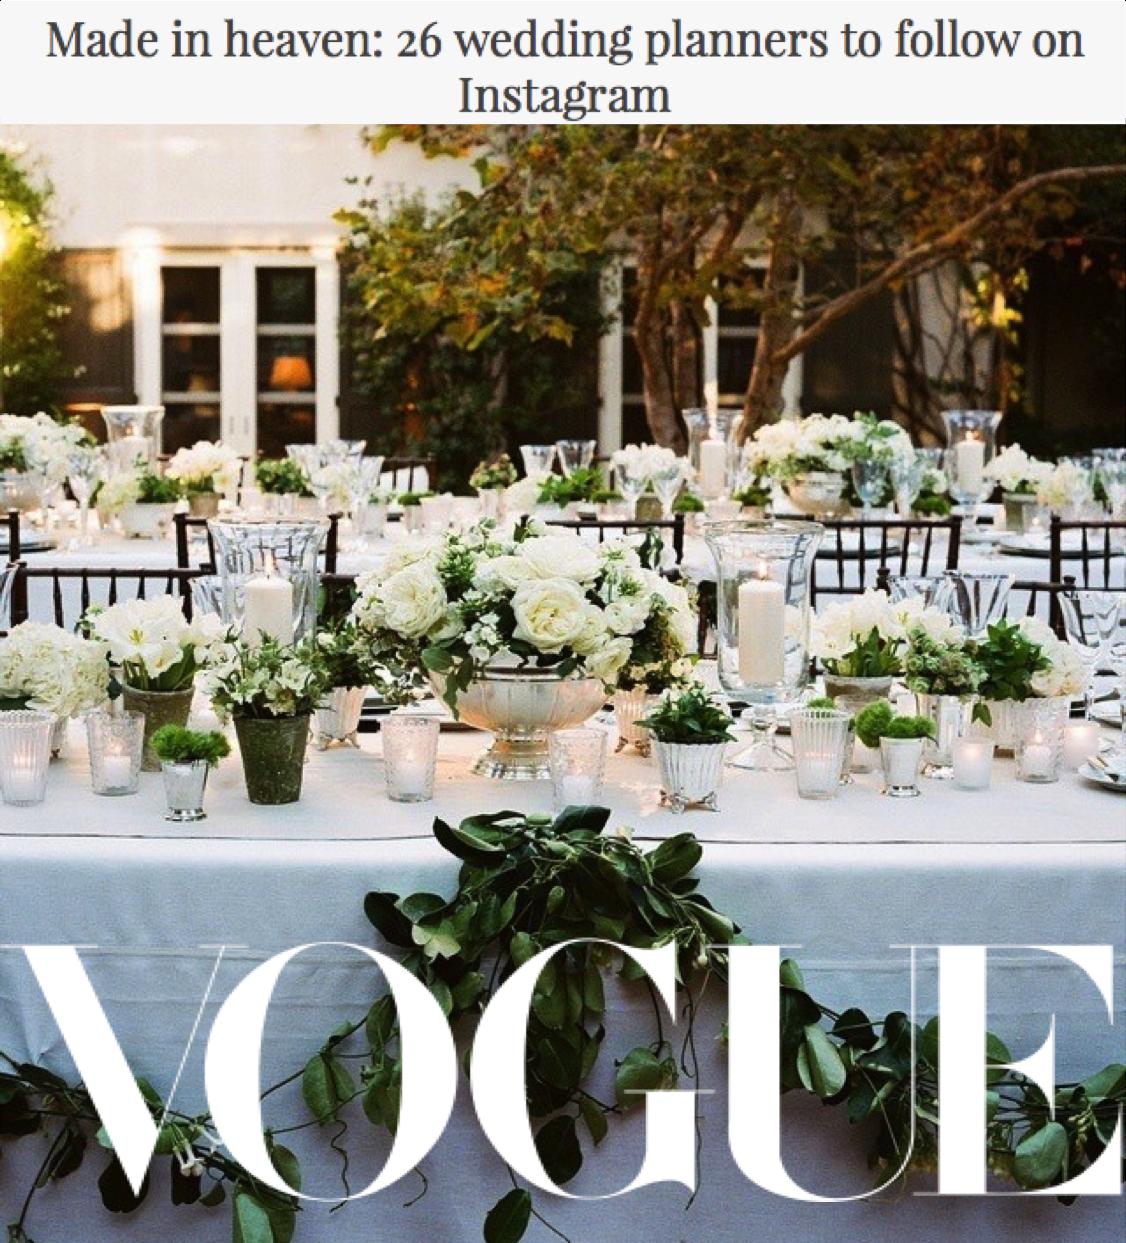 Vogue Instagram Accounts To Follow